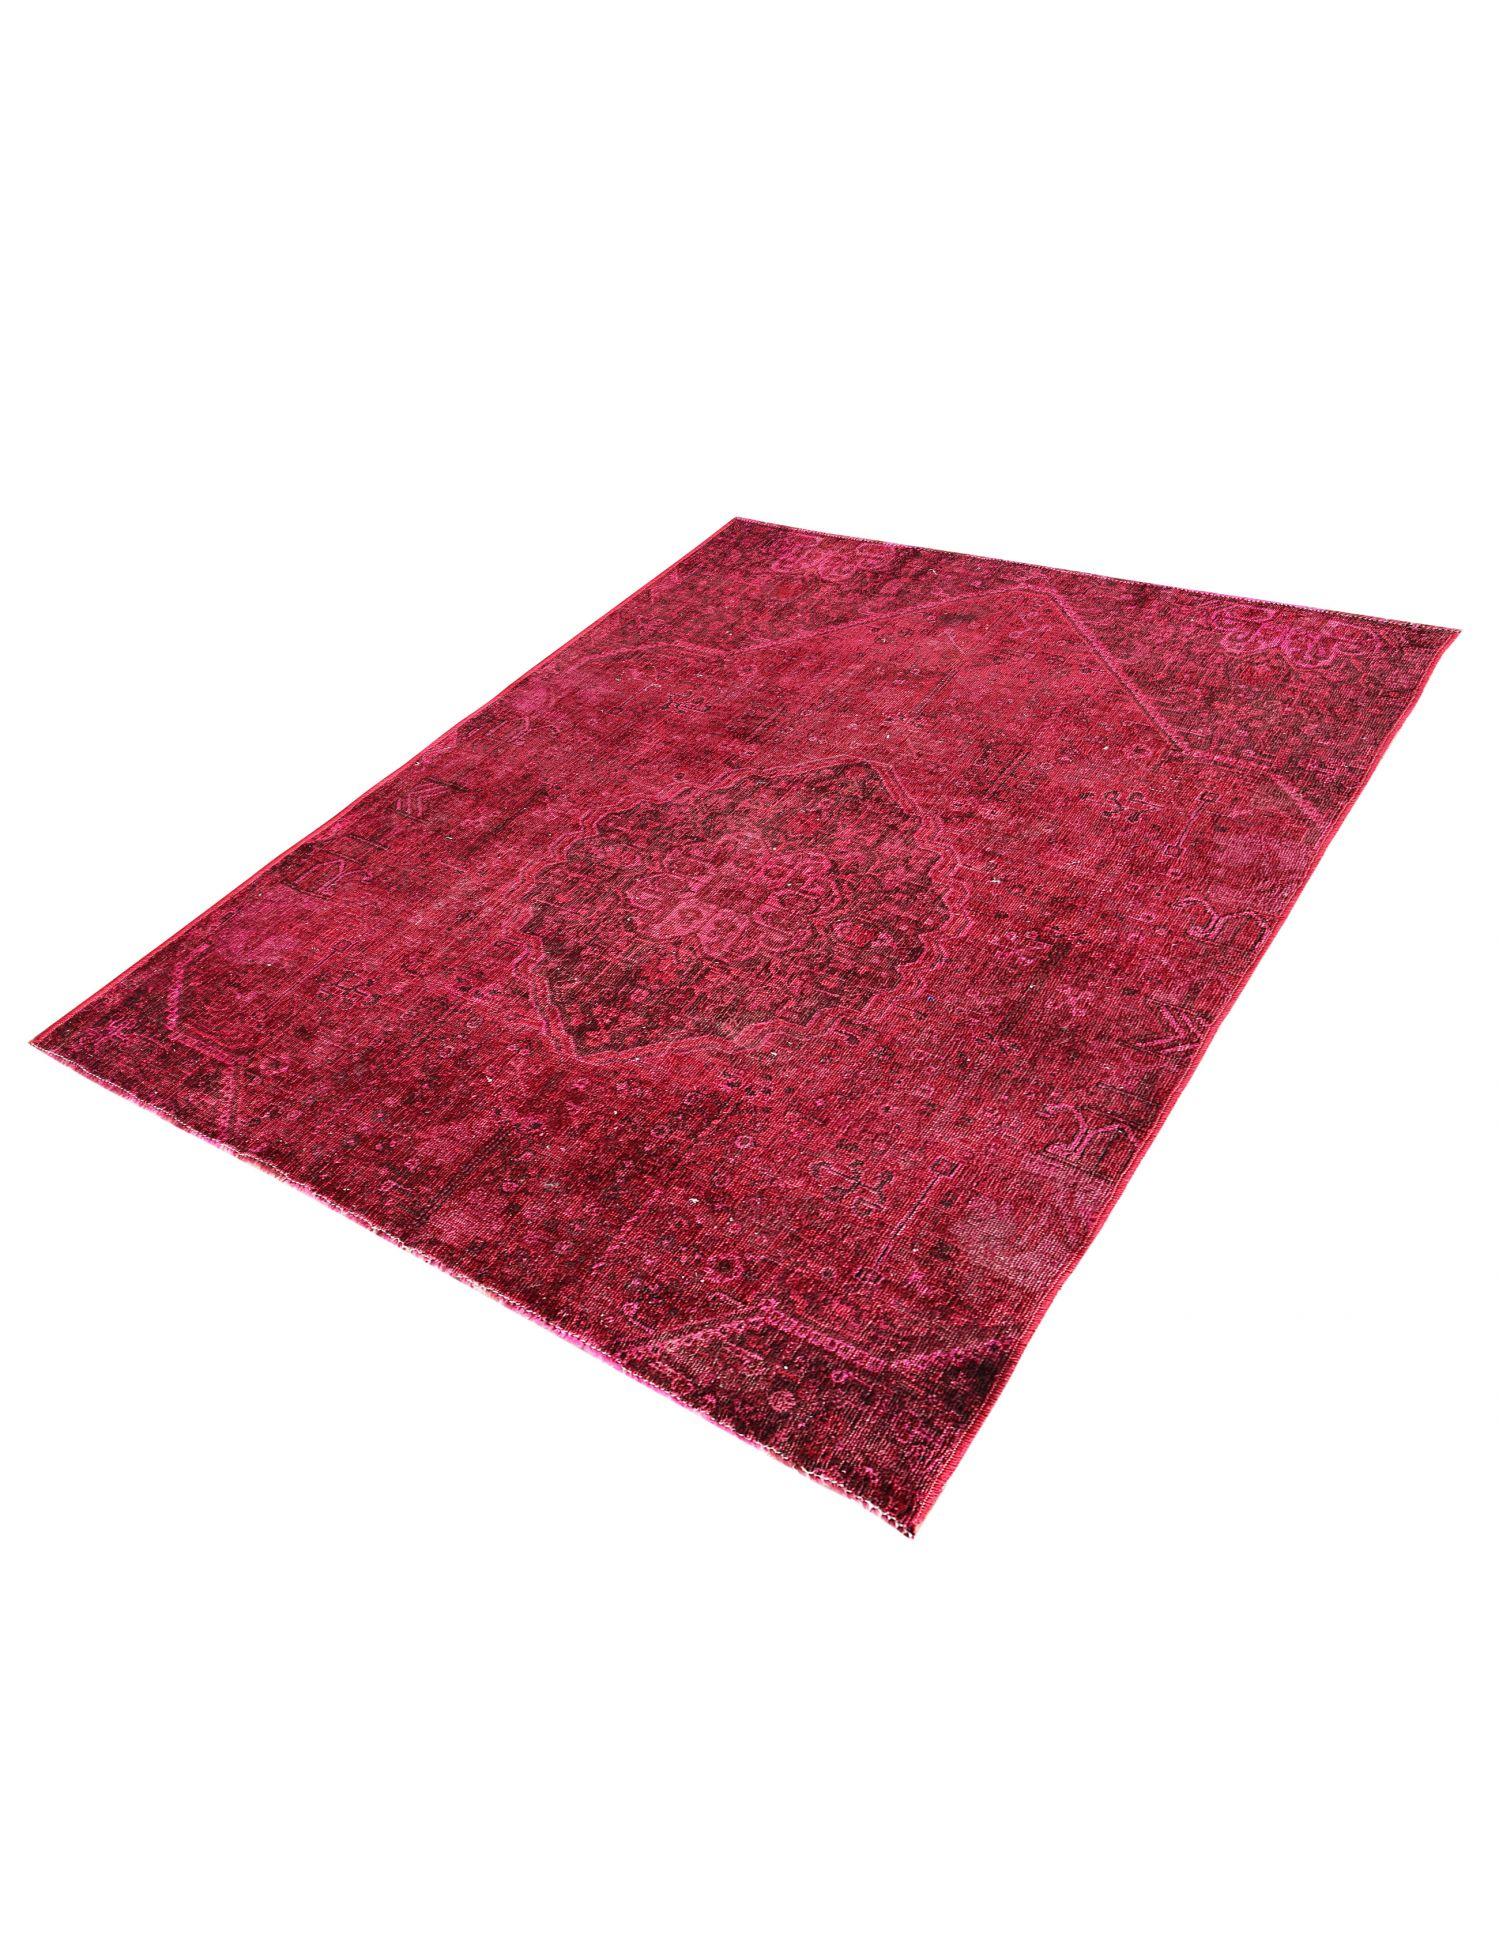 Tappeto Vintage  rosso <br/>201 x 148 cm